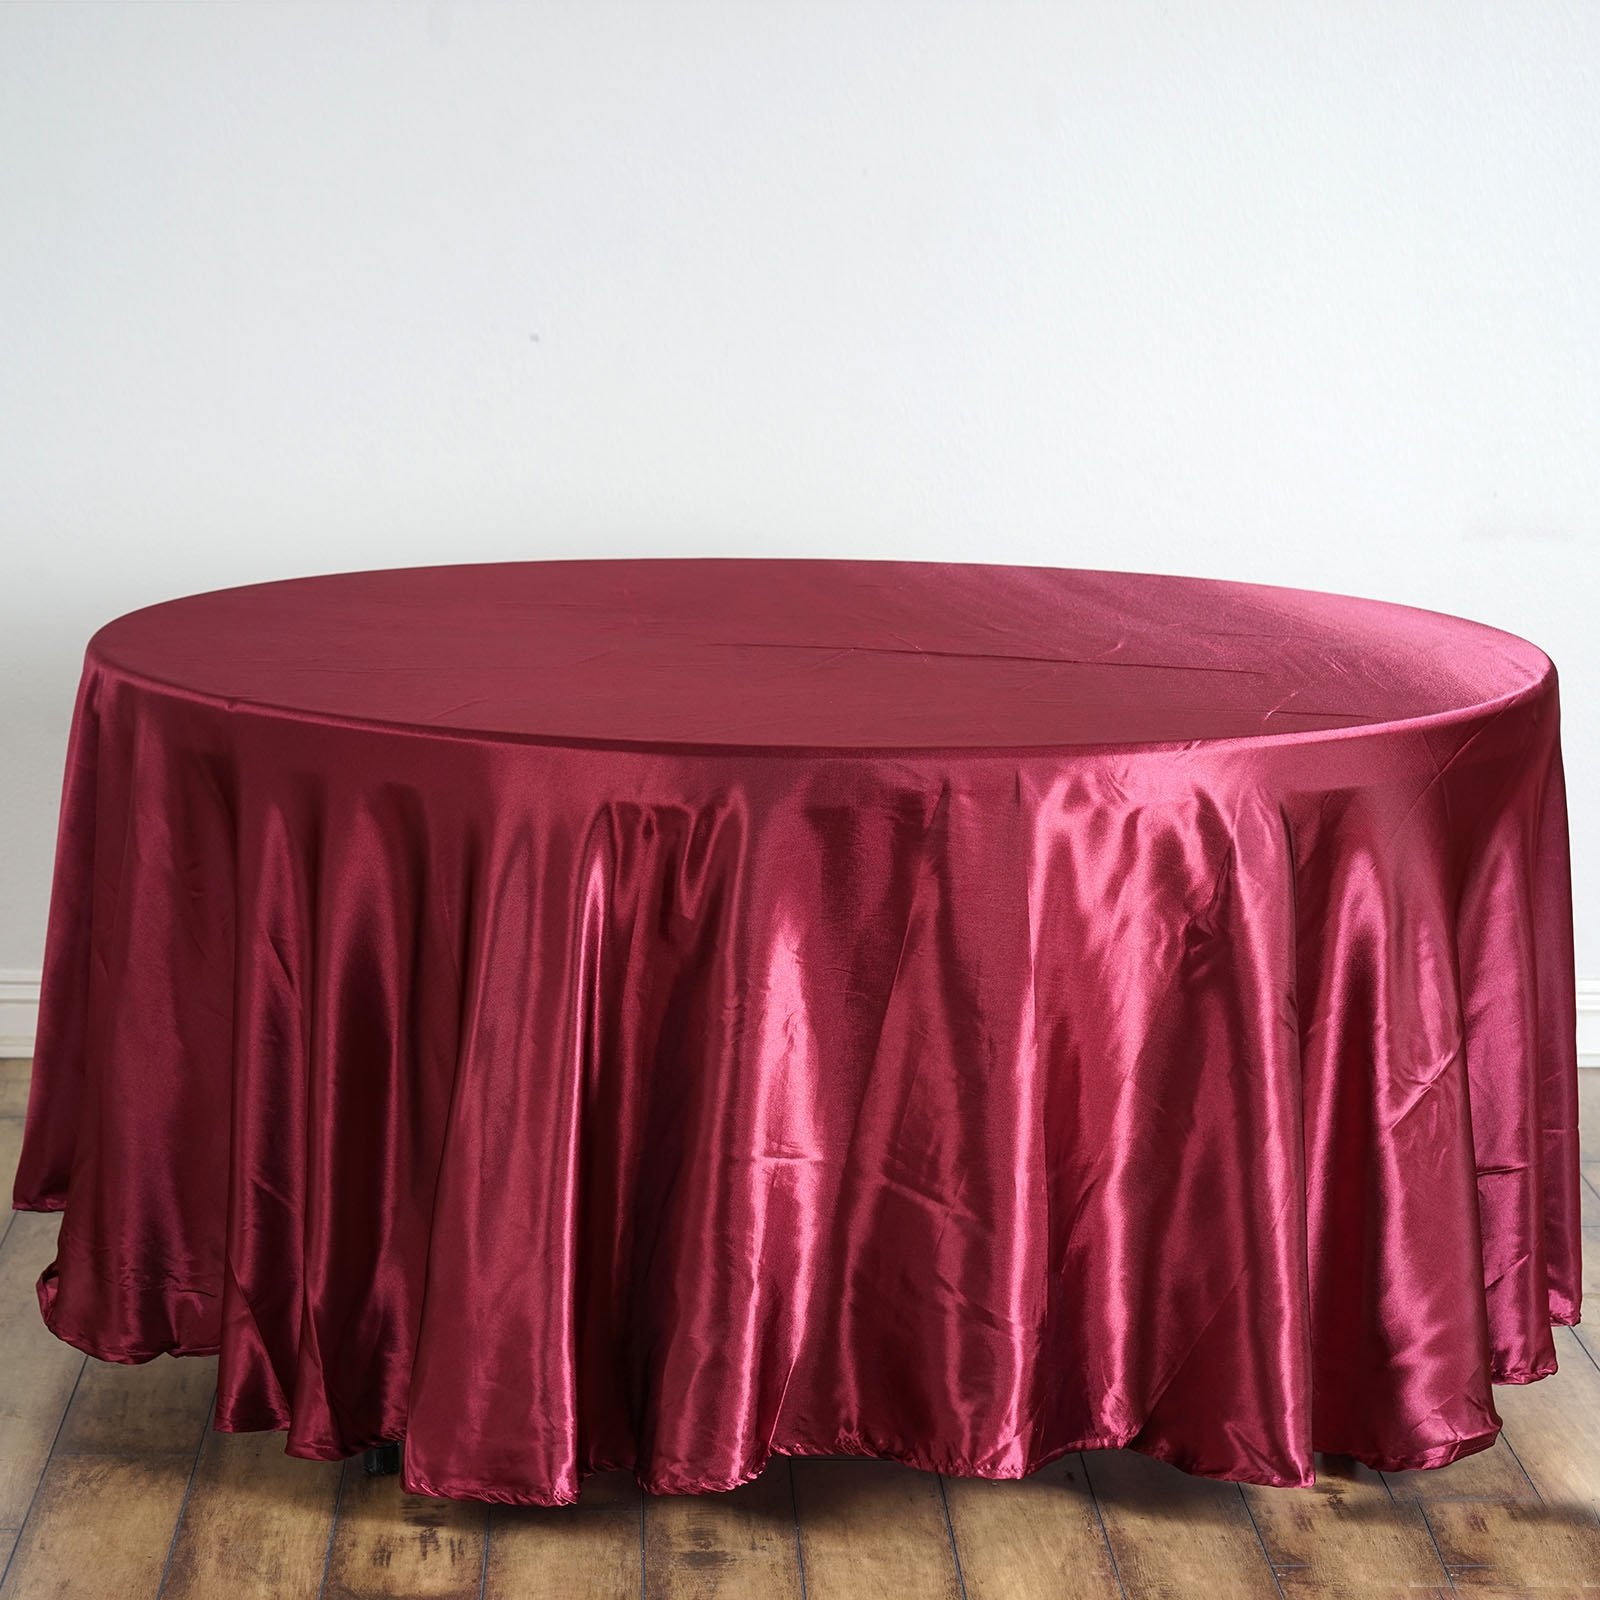 Burgandy Satin Round Tablecloth